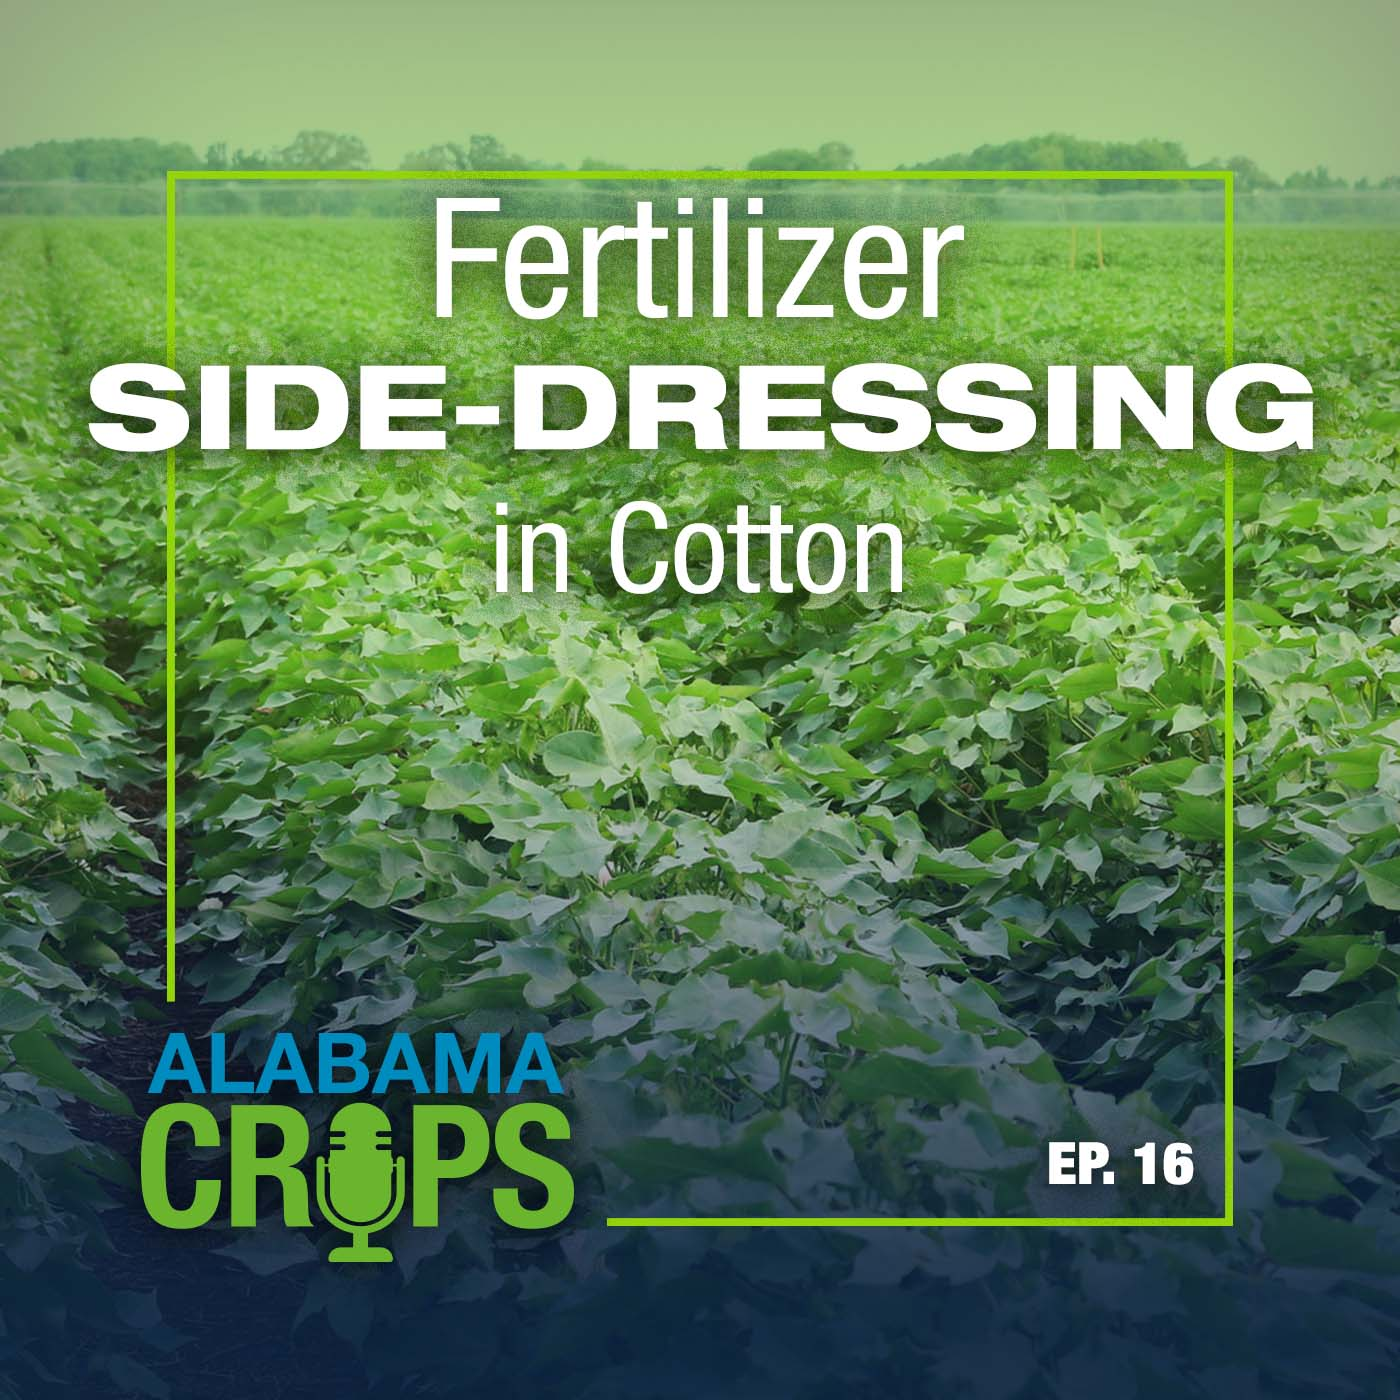 Episode 16 - Fertilizer Side-Dressing in Cotton